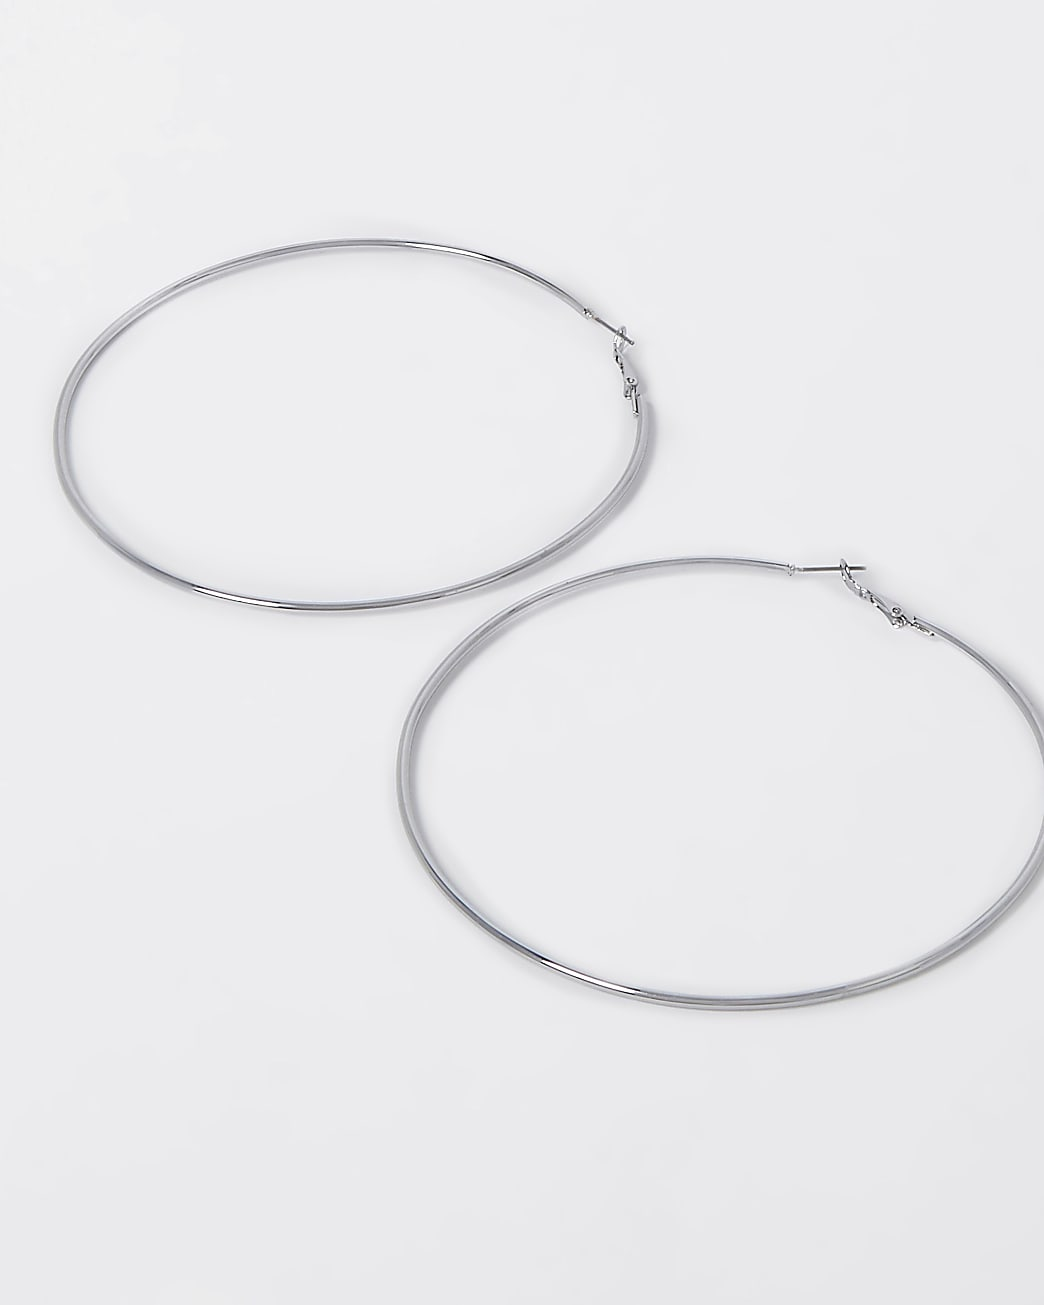 Silver oversized hoops